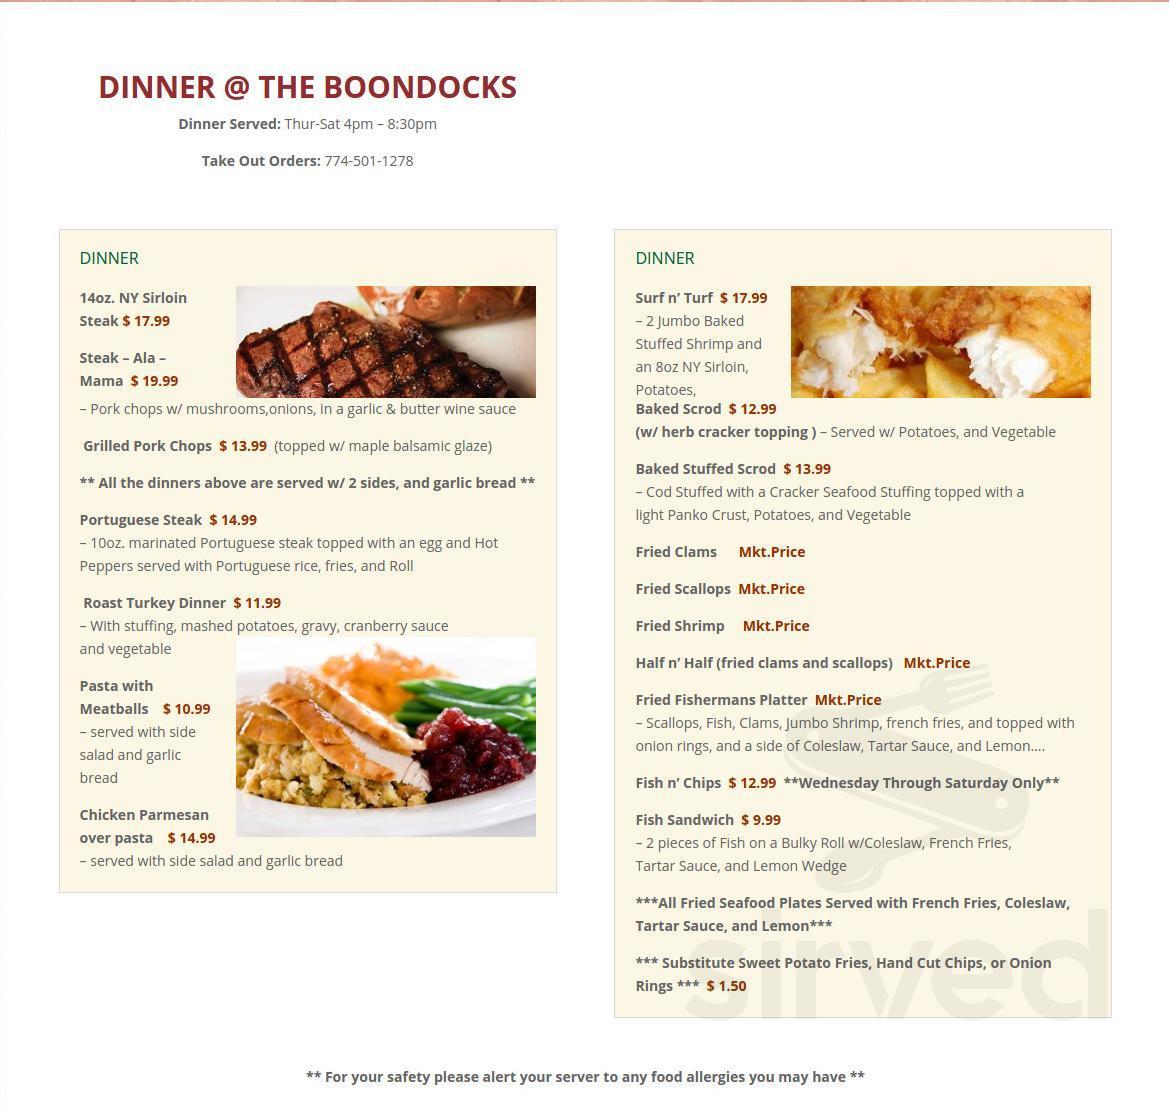 The Boondocks menu in Berkley, Massachusetts, USA